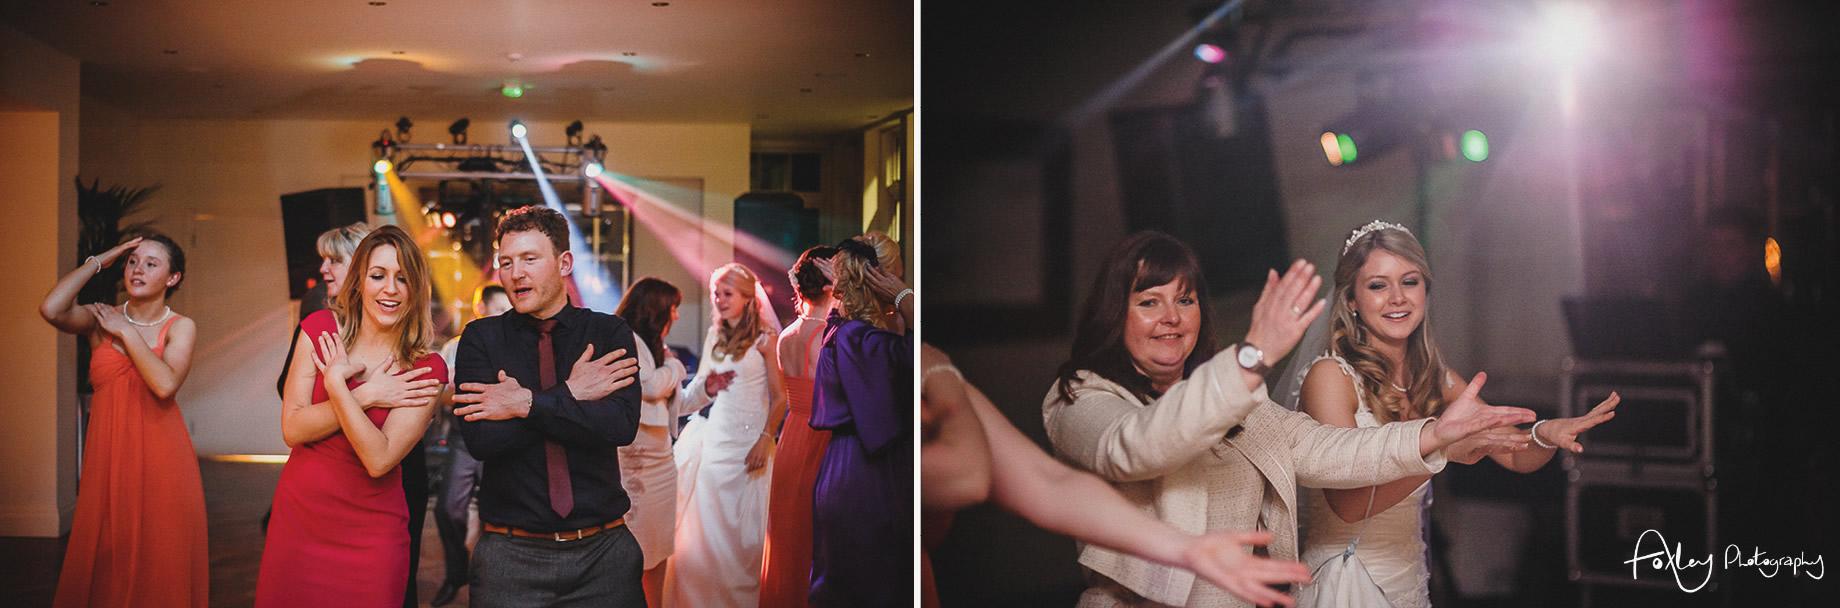 Gemma and Lewis' Wedding at Mitton Hall 177